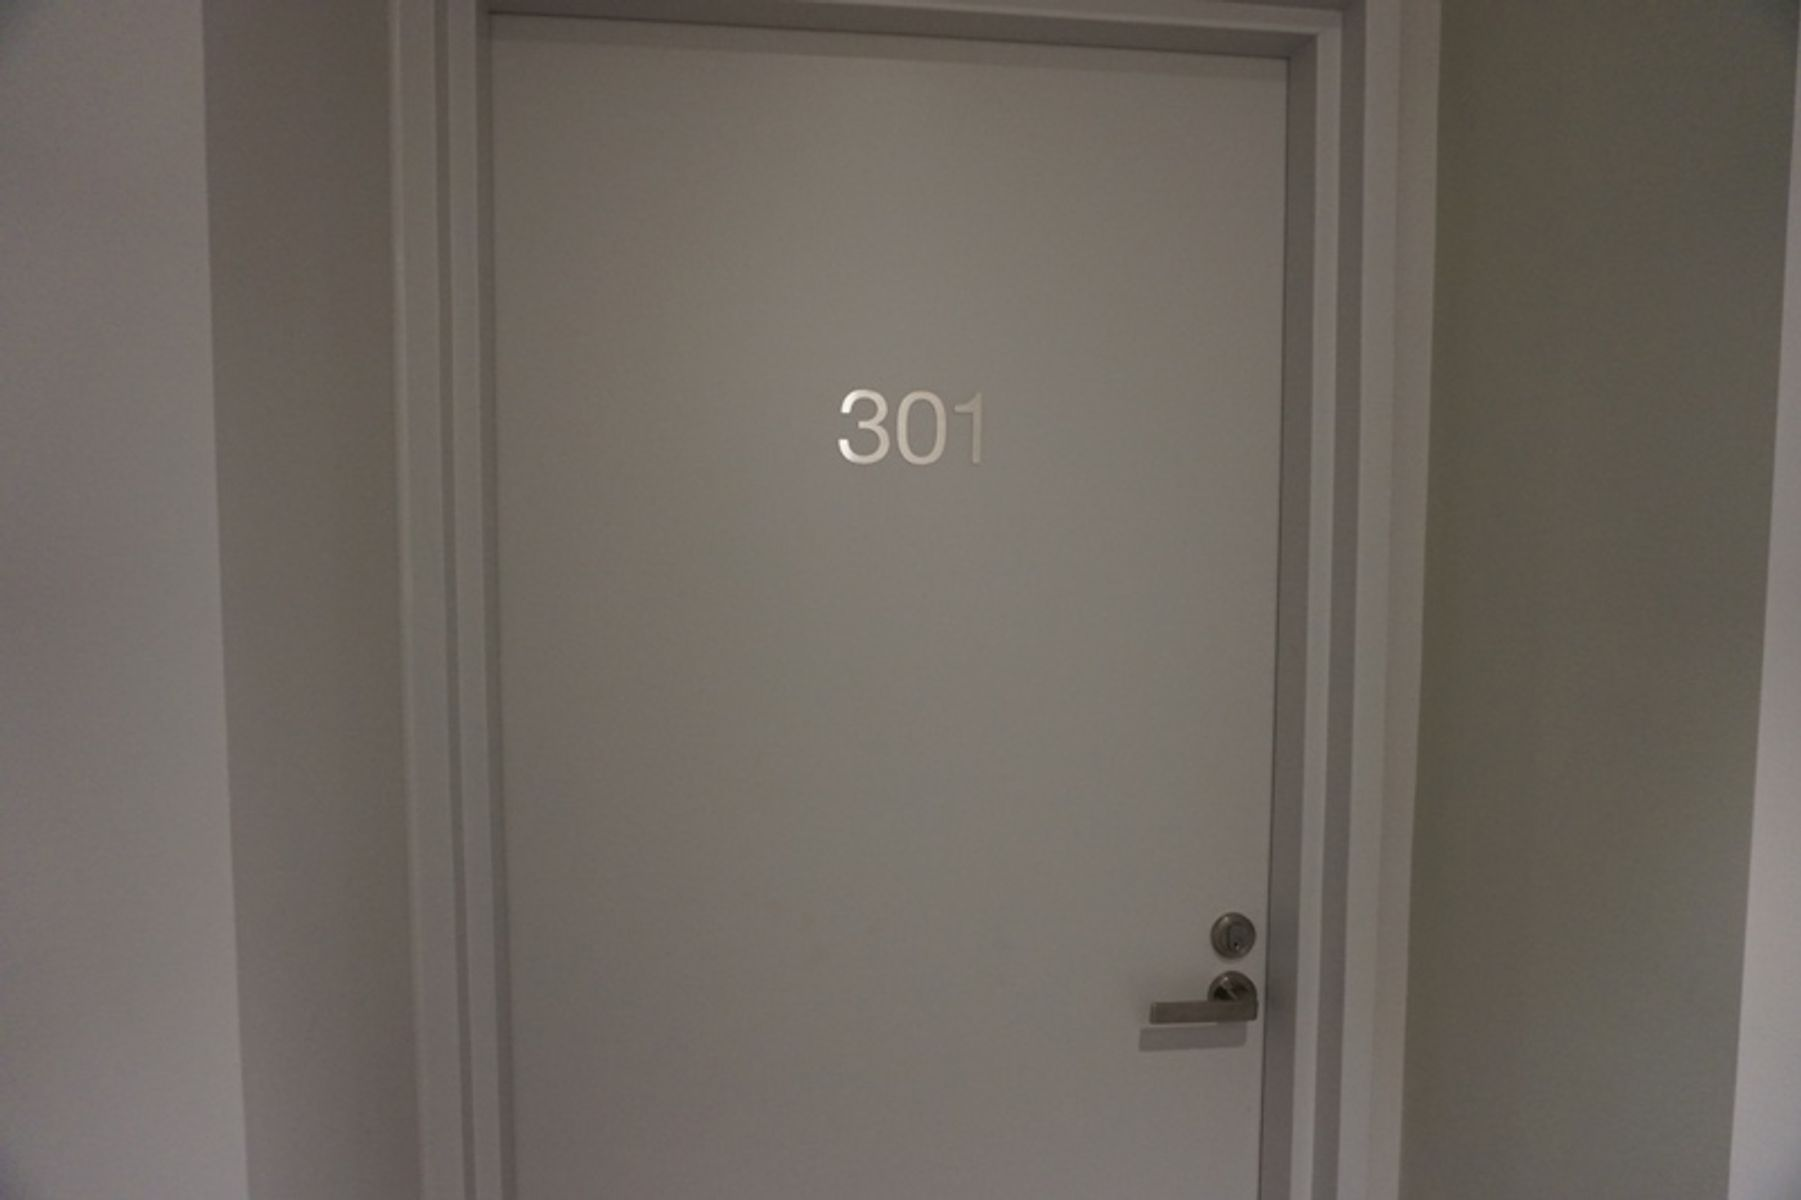 301/1 Clark Street, Williams Landing, VIC 3027